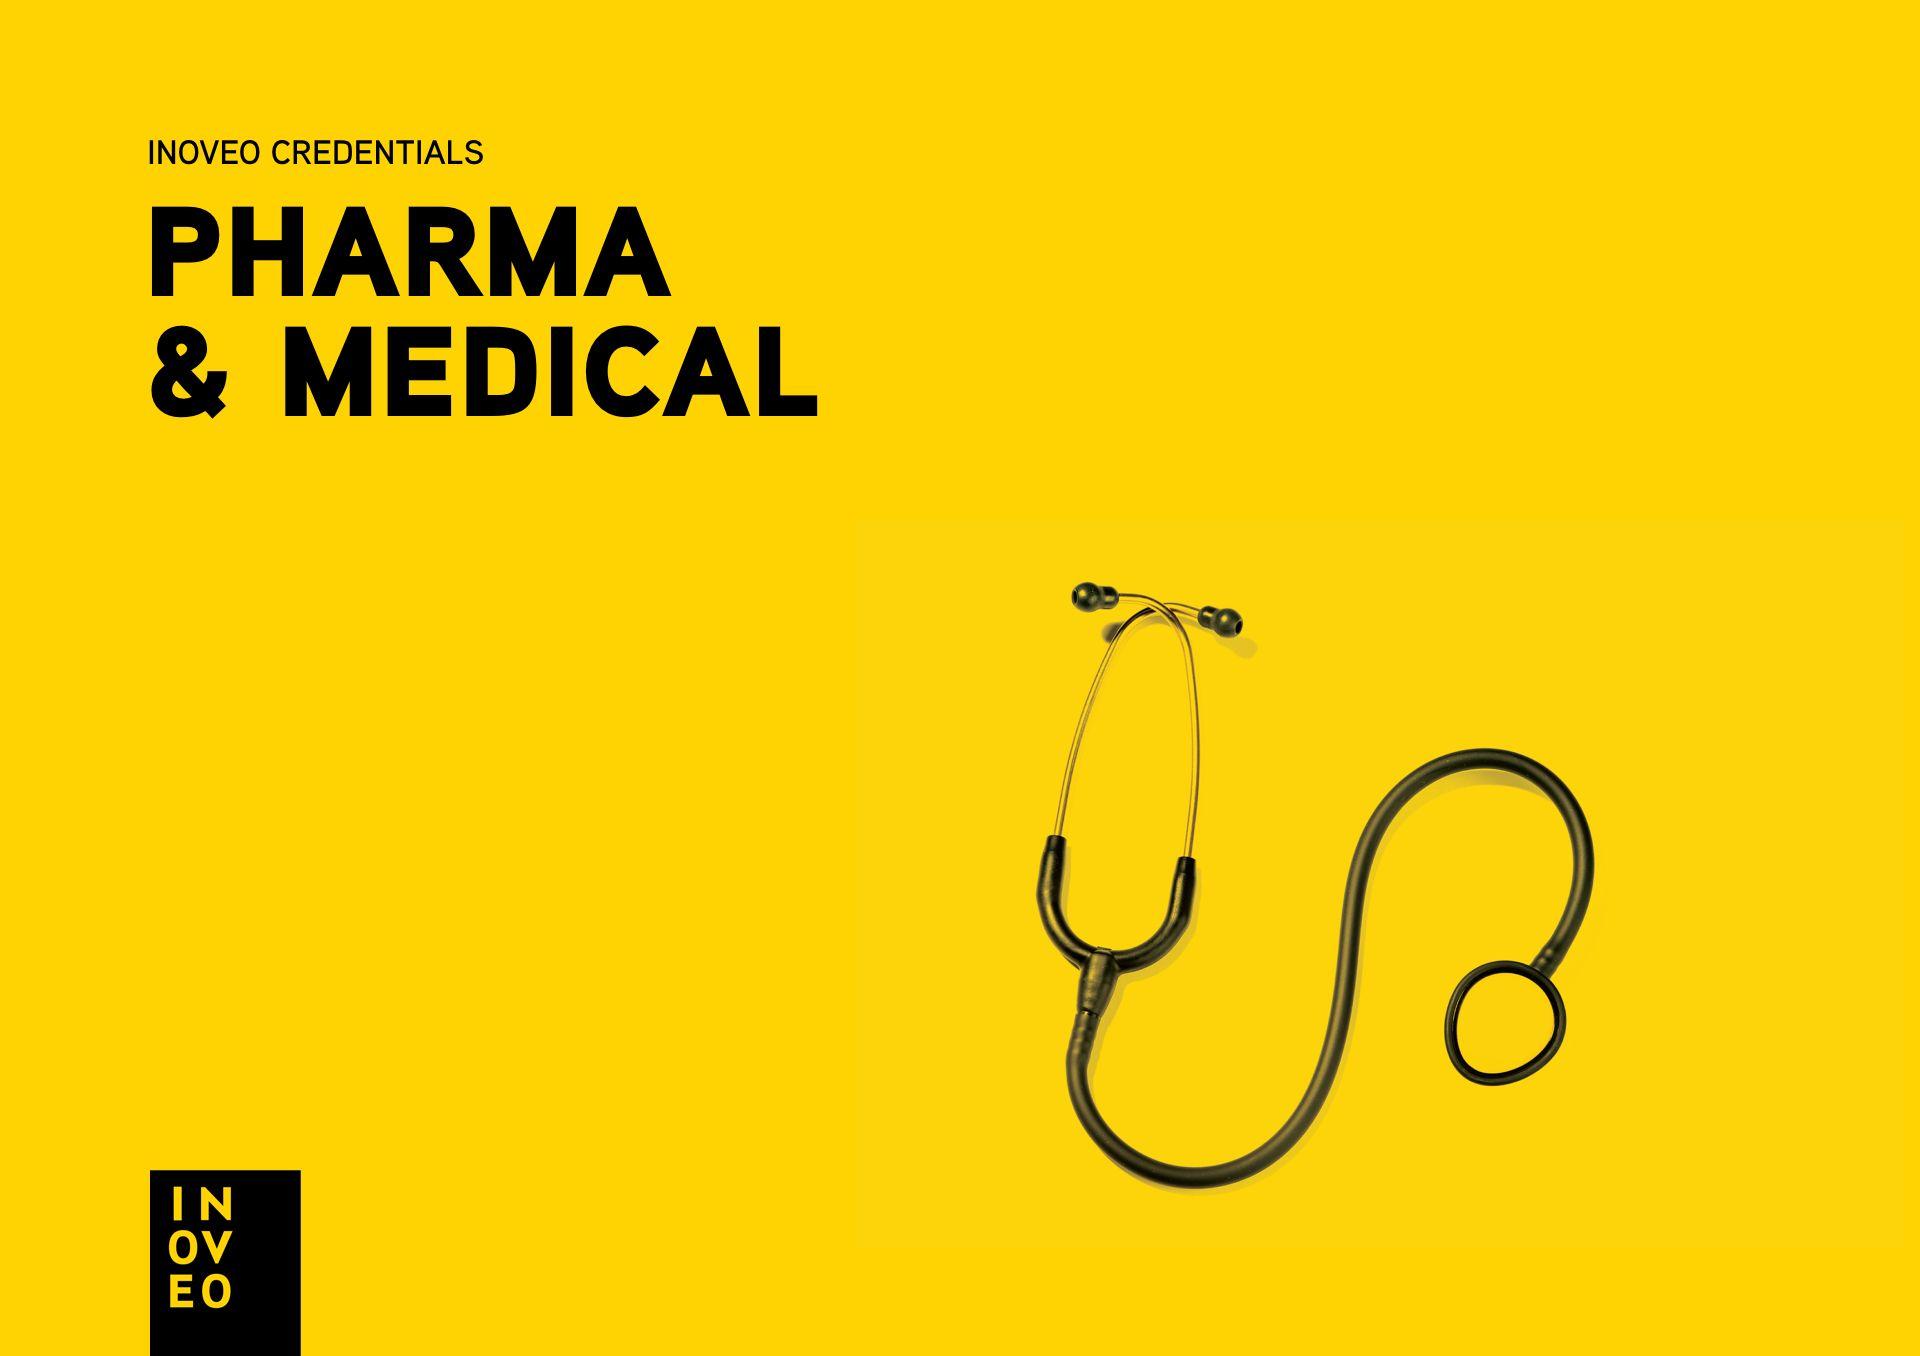 pharma & medical credentials INOVEO branding